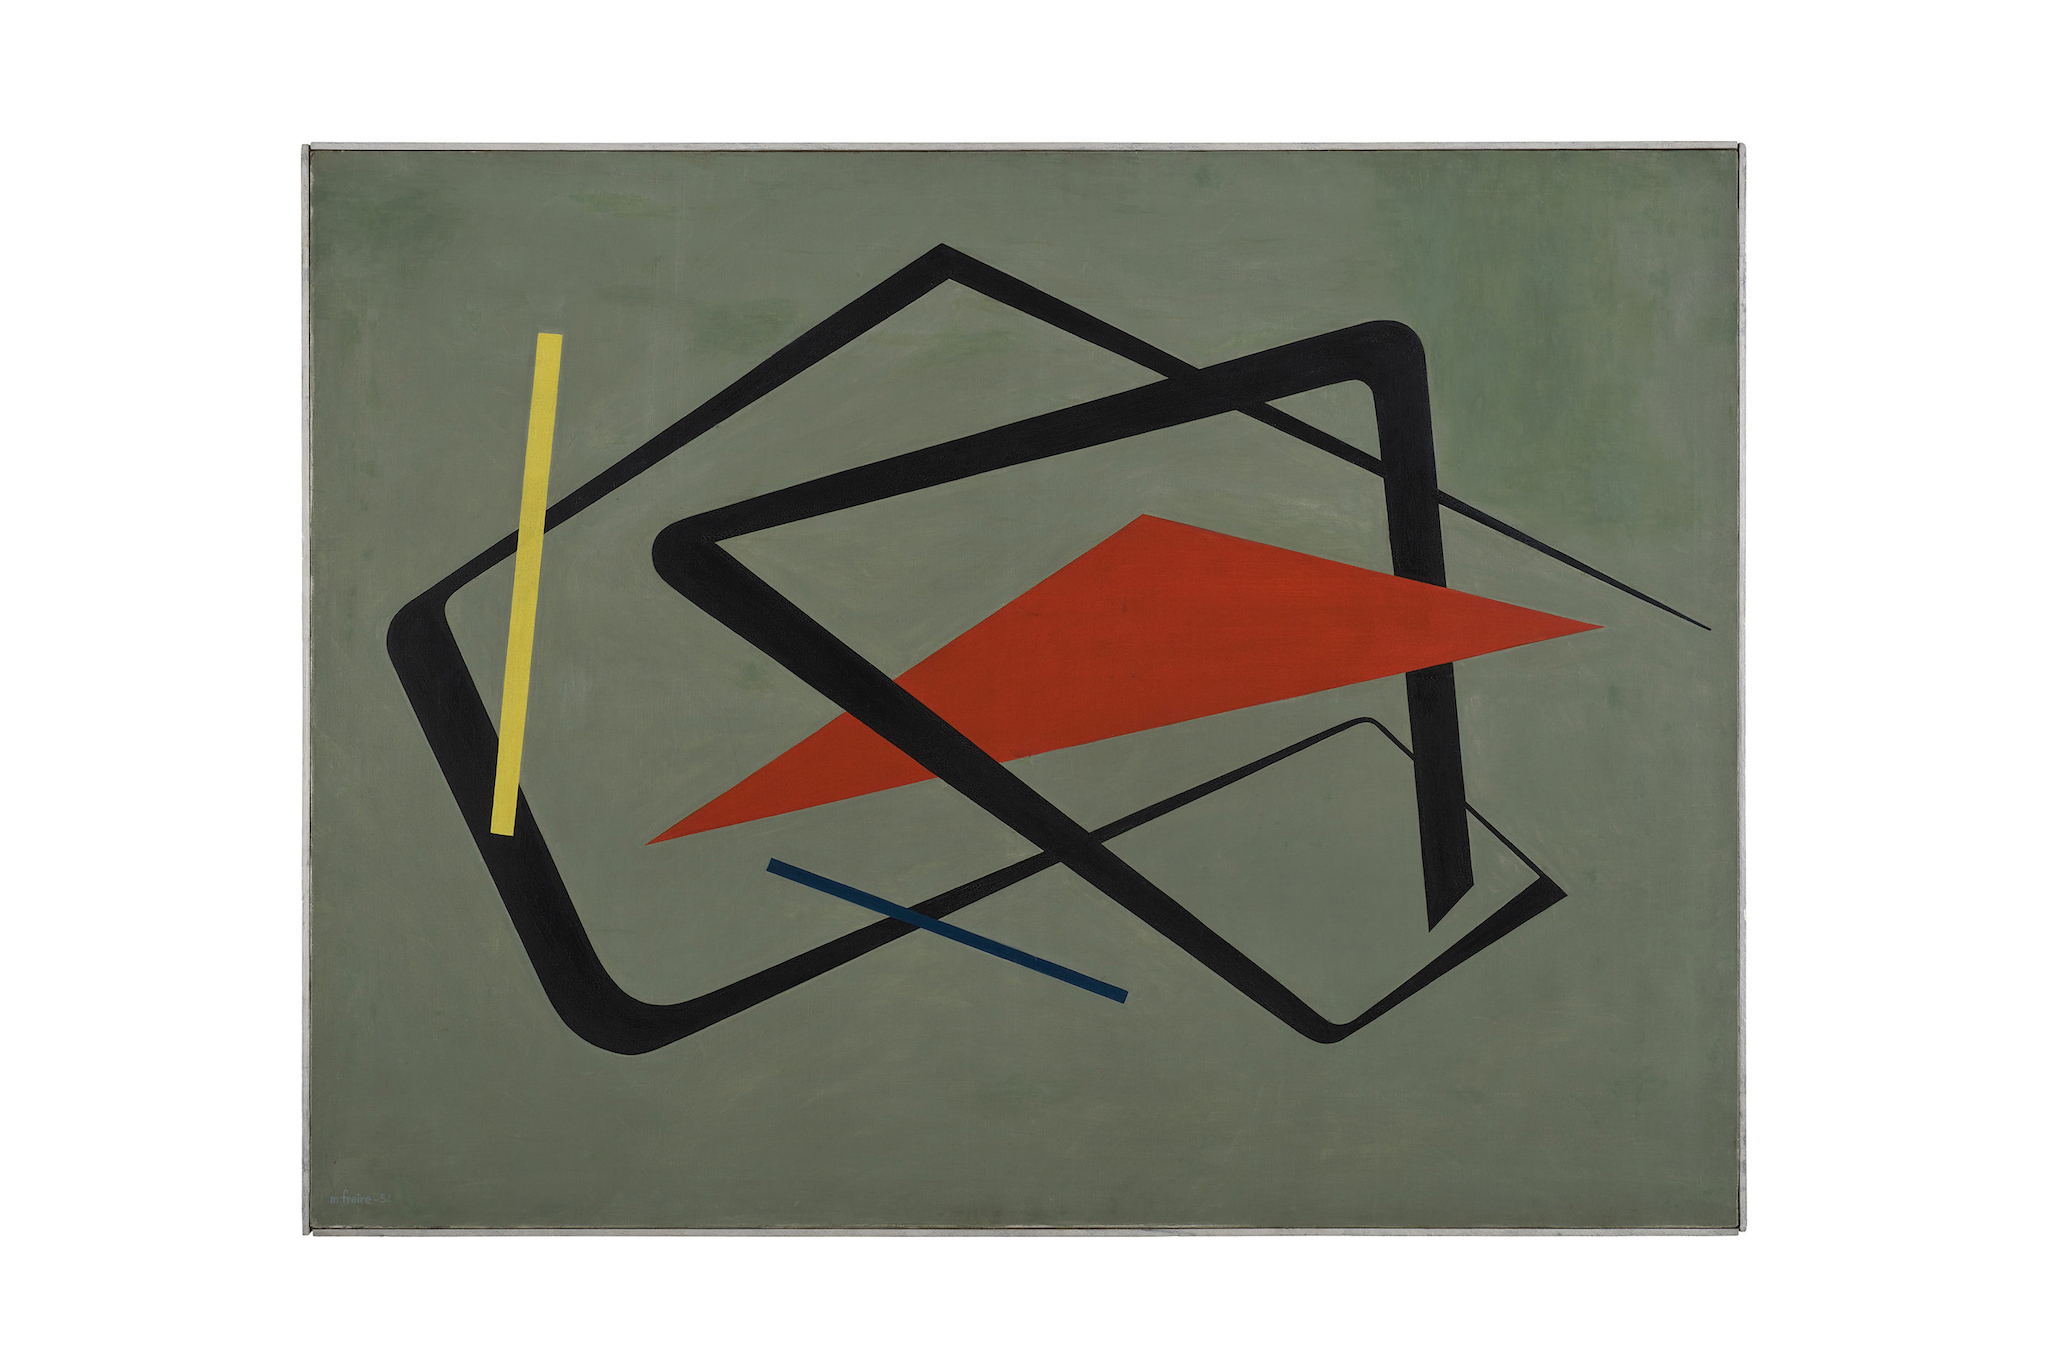 María Freire, Untitled, 1954